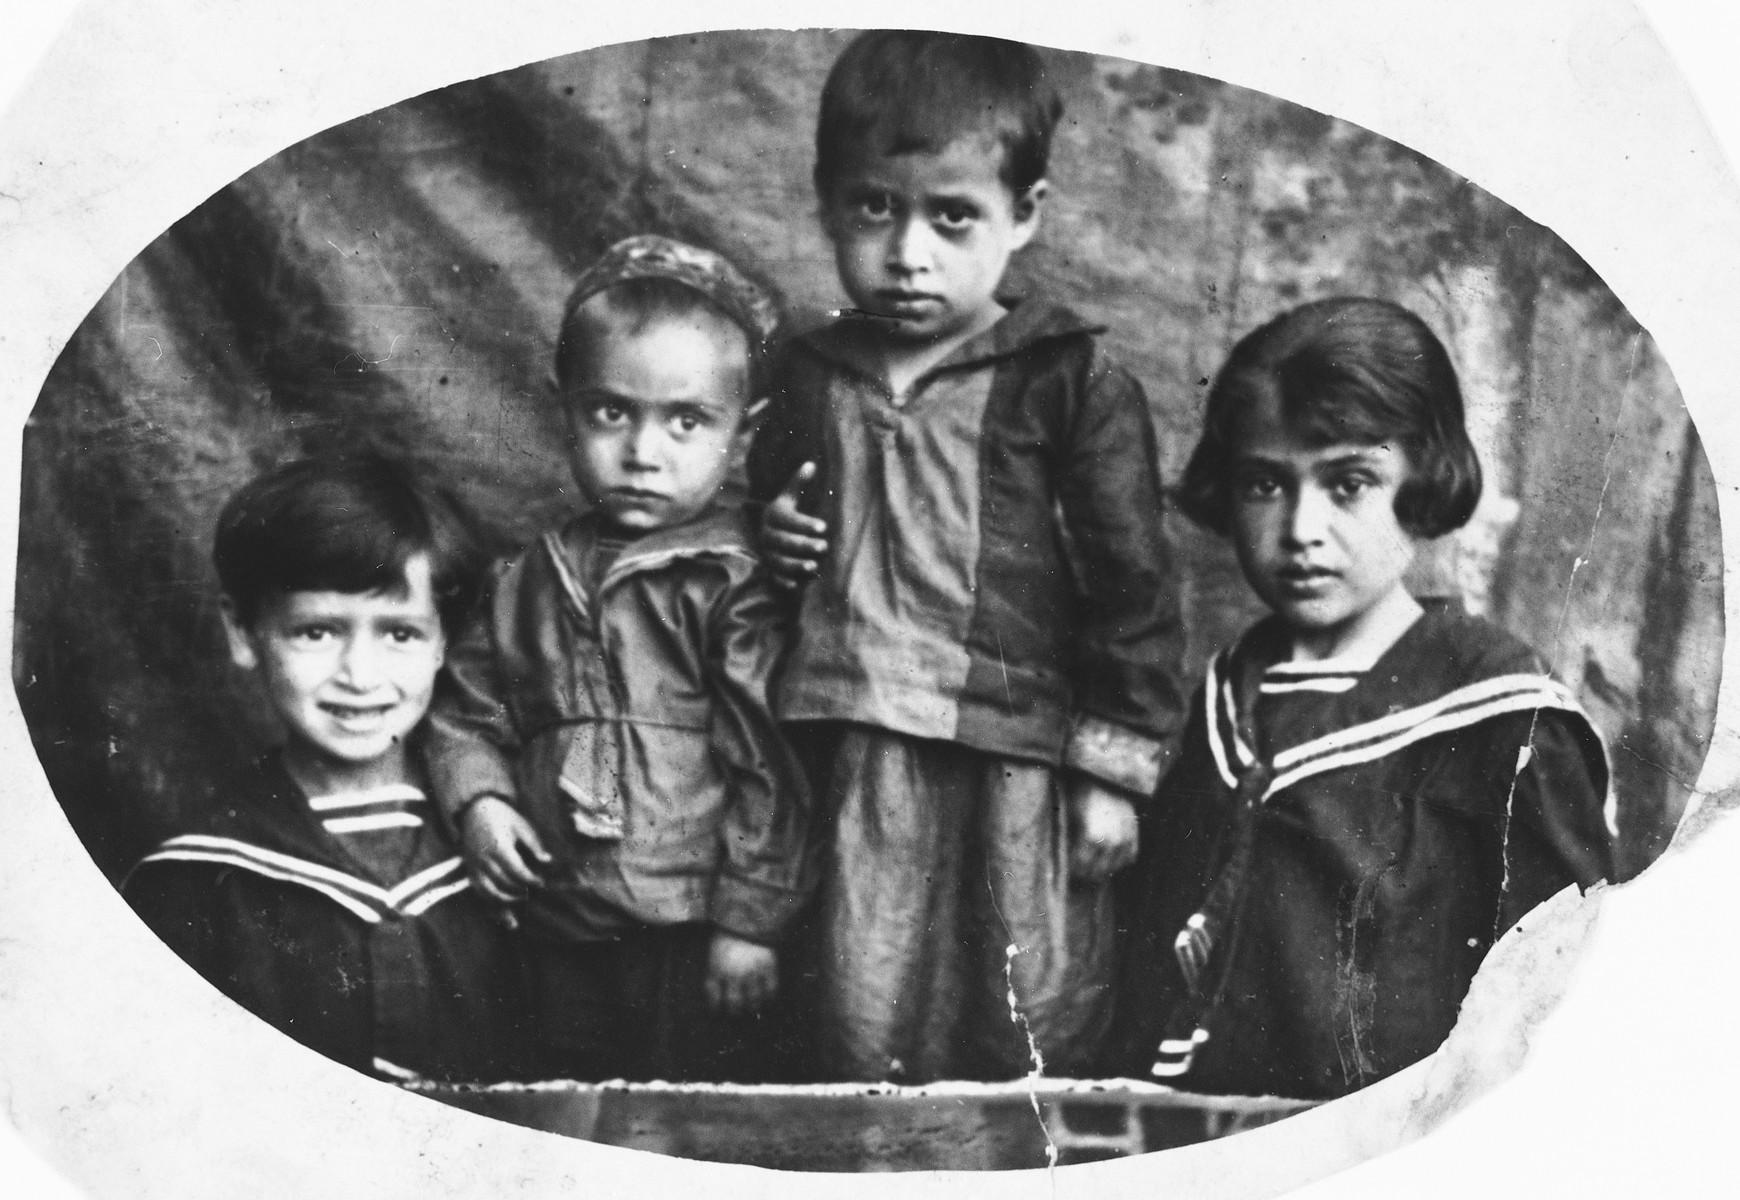 Studio portrait of four Jewish children in Chechersk, Belarus.  Pictured are Maria, Leva, Fanya and Ester Gerchikova.